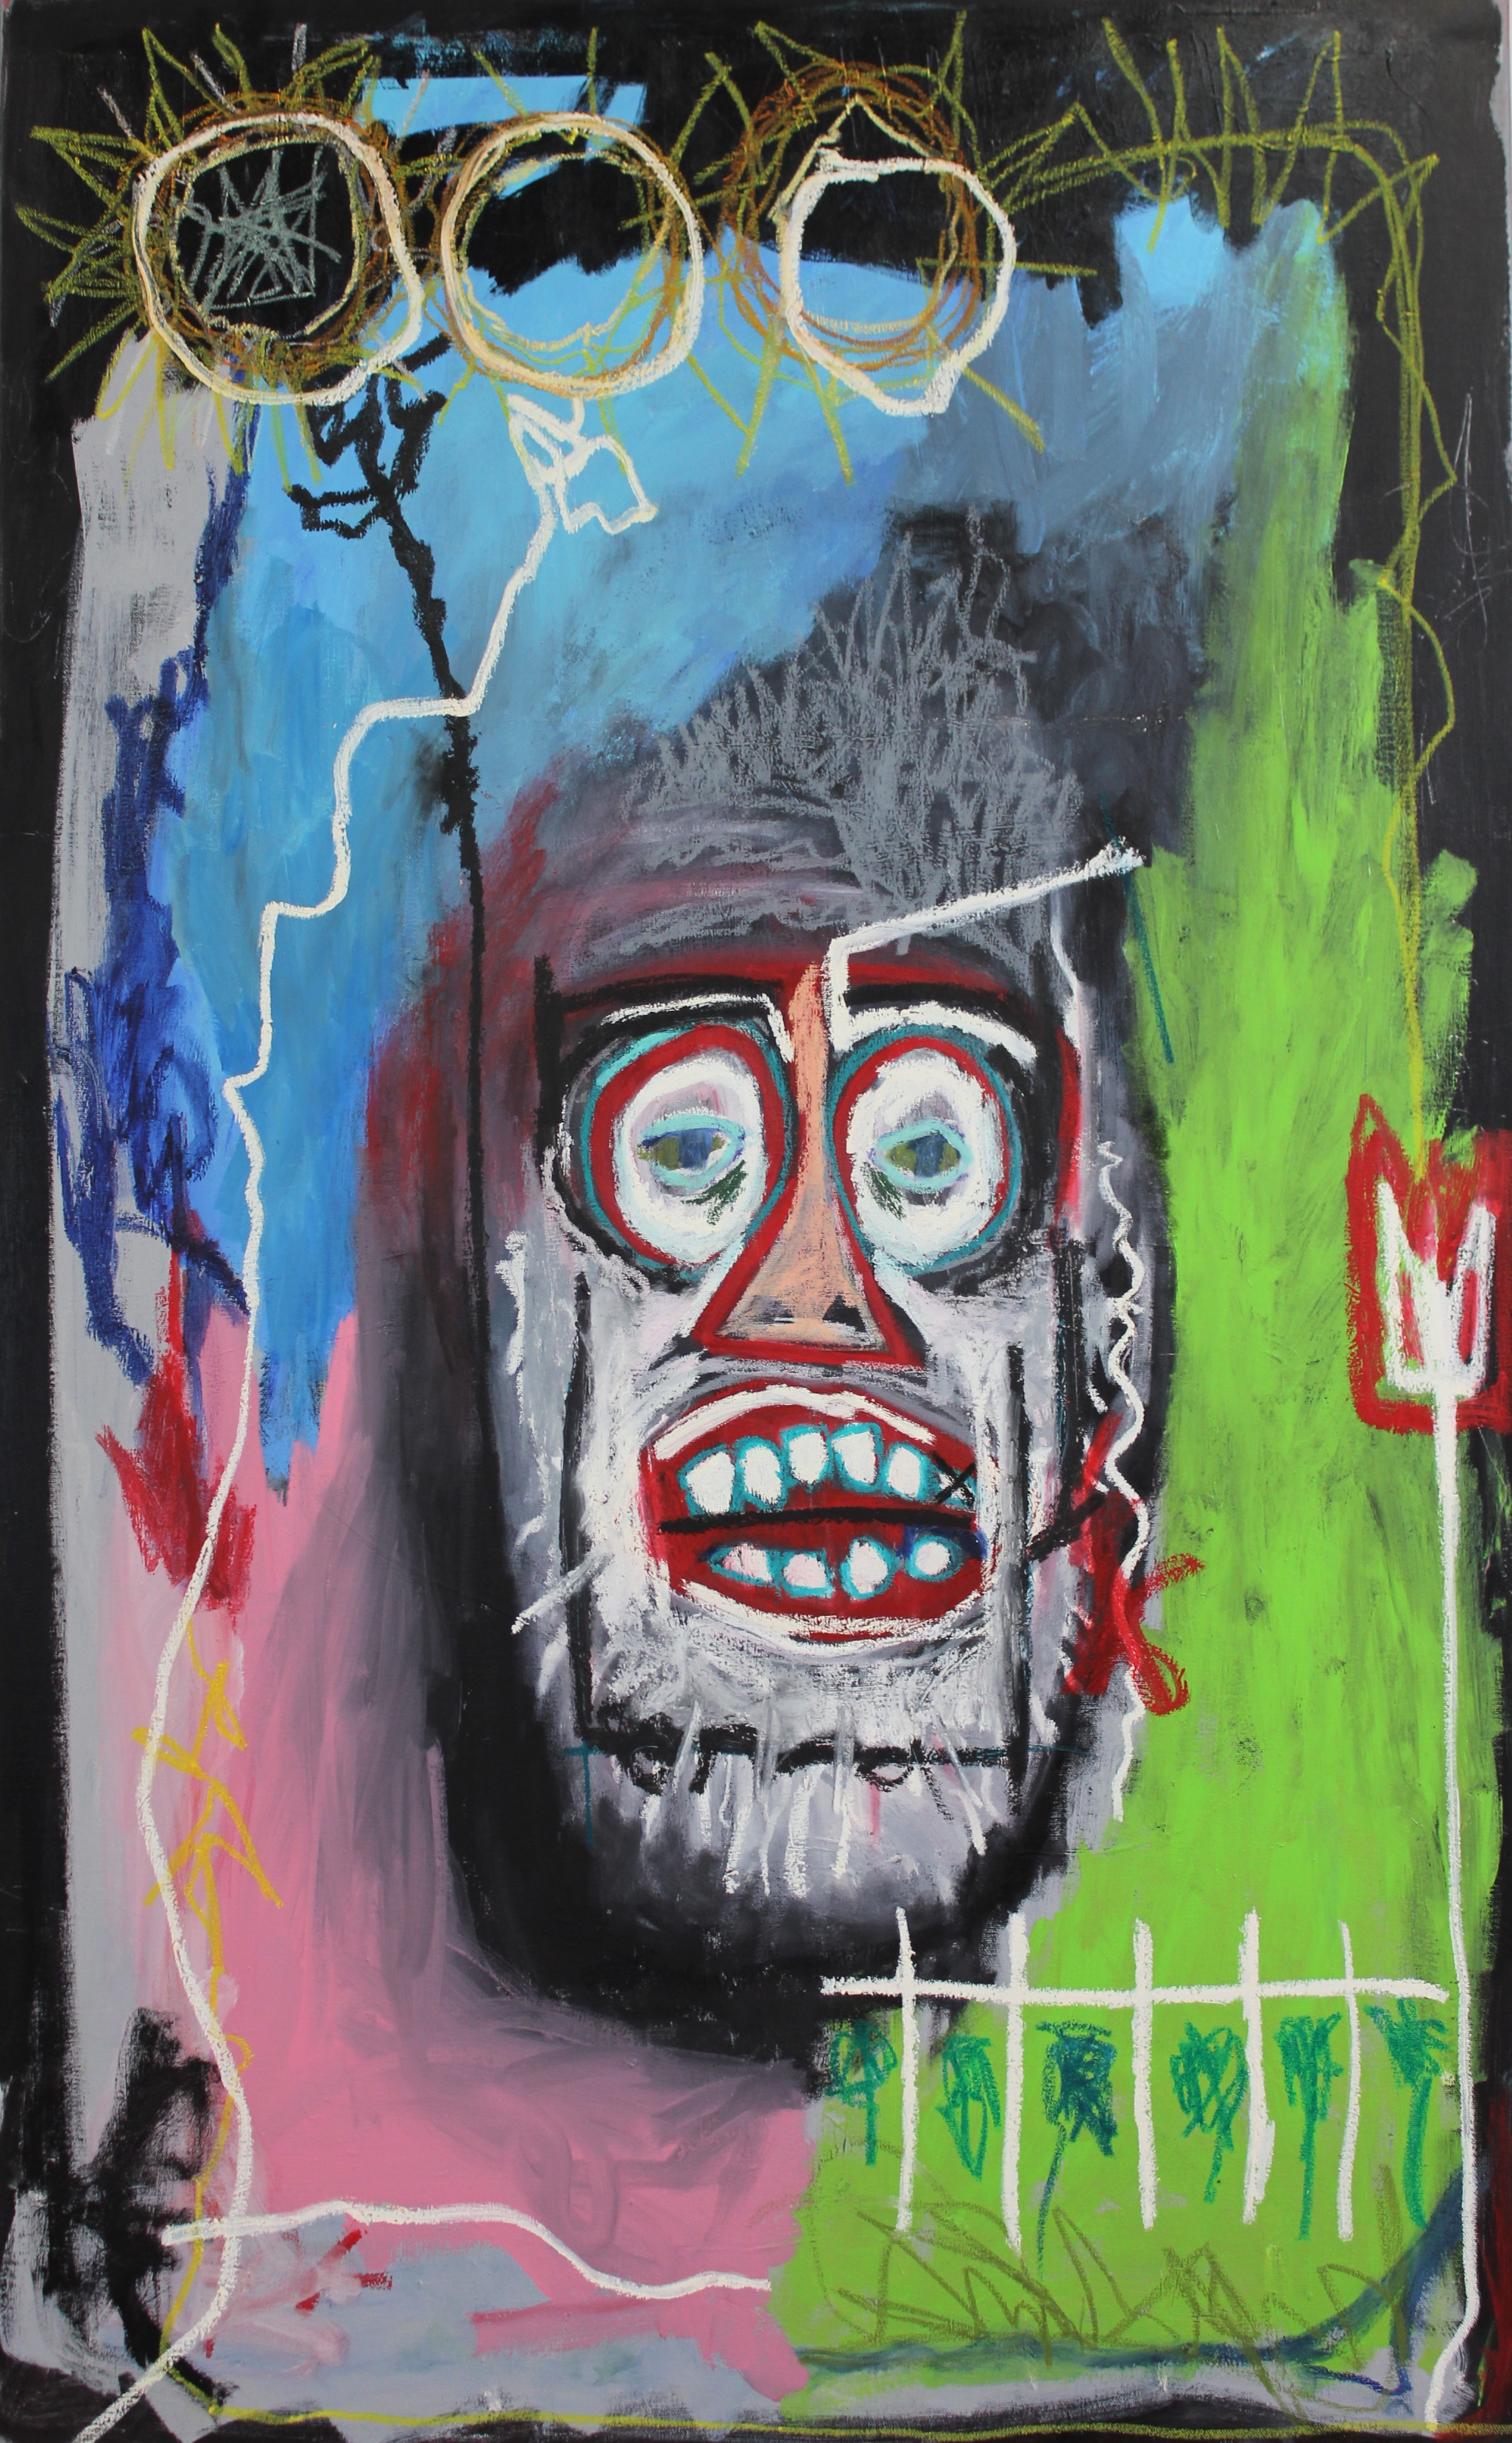 Untitled (Self Portrait) 2011